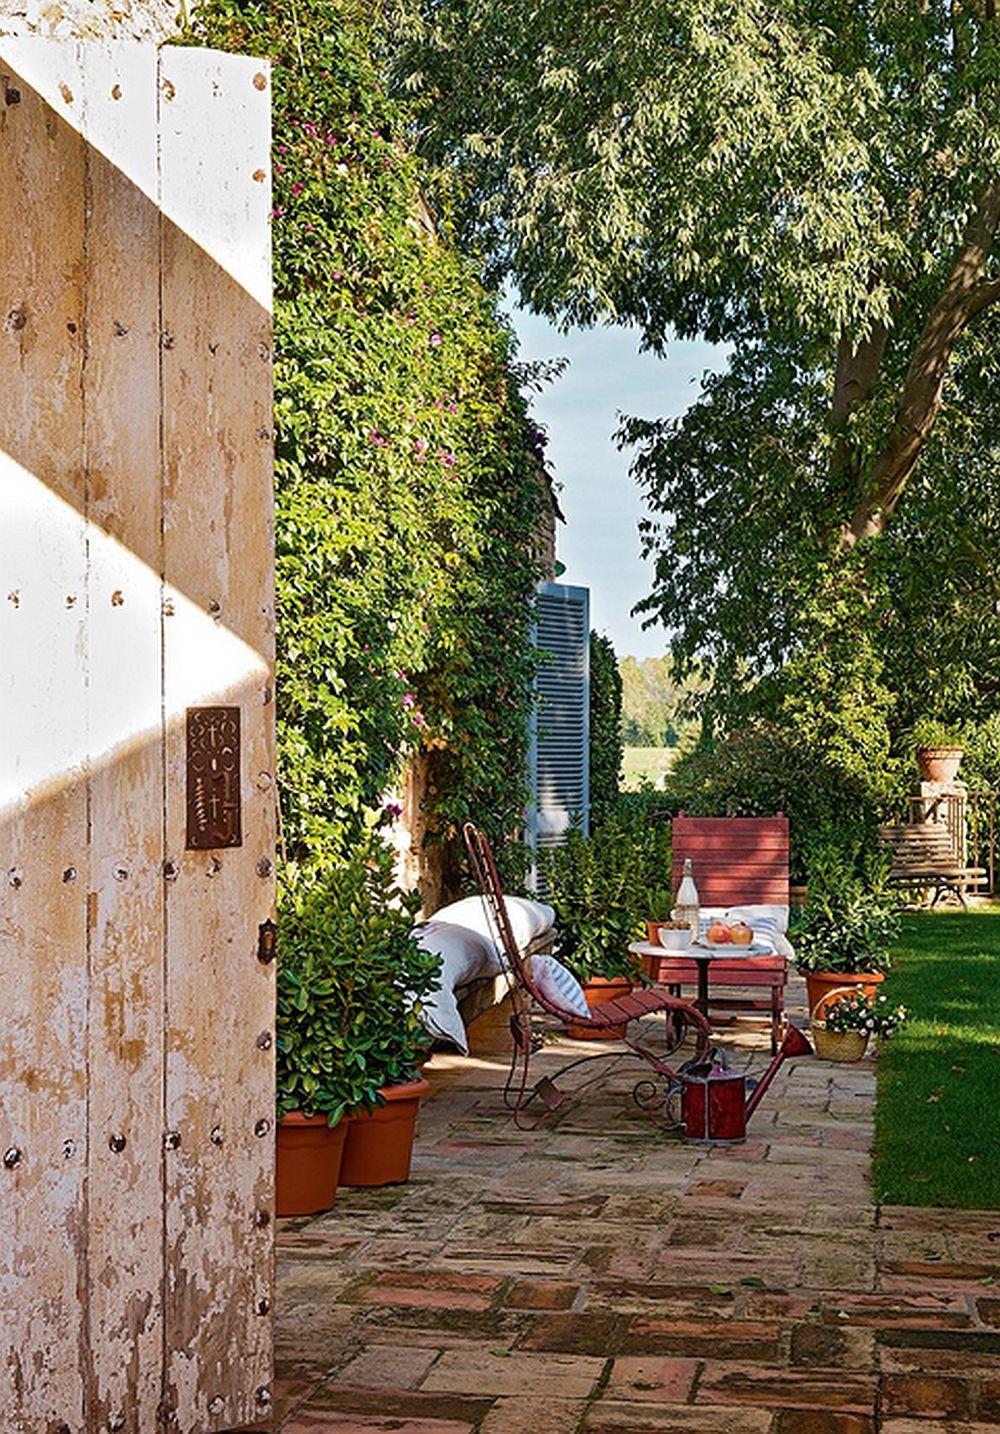 adelaparvu.com despre casa rustica Spania, hambar transformat in casa, arhitecti Lluís Auquer si Ferran Prats (2)